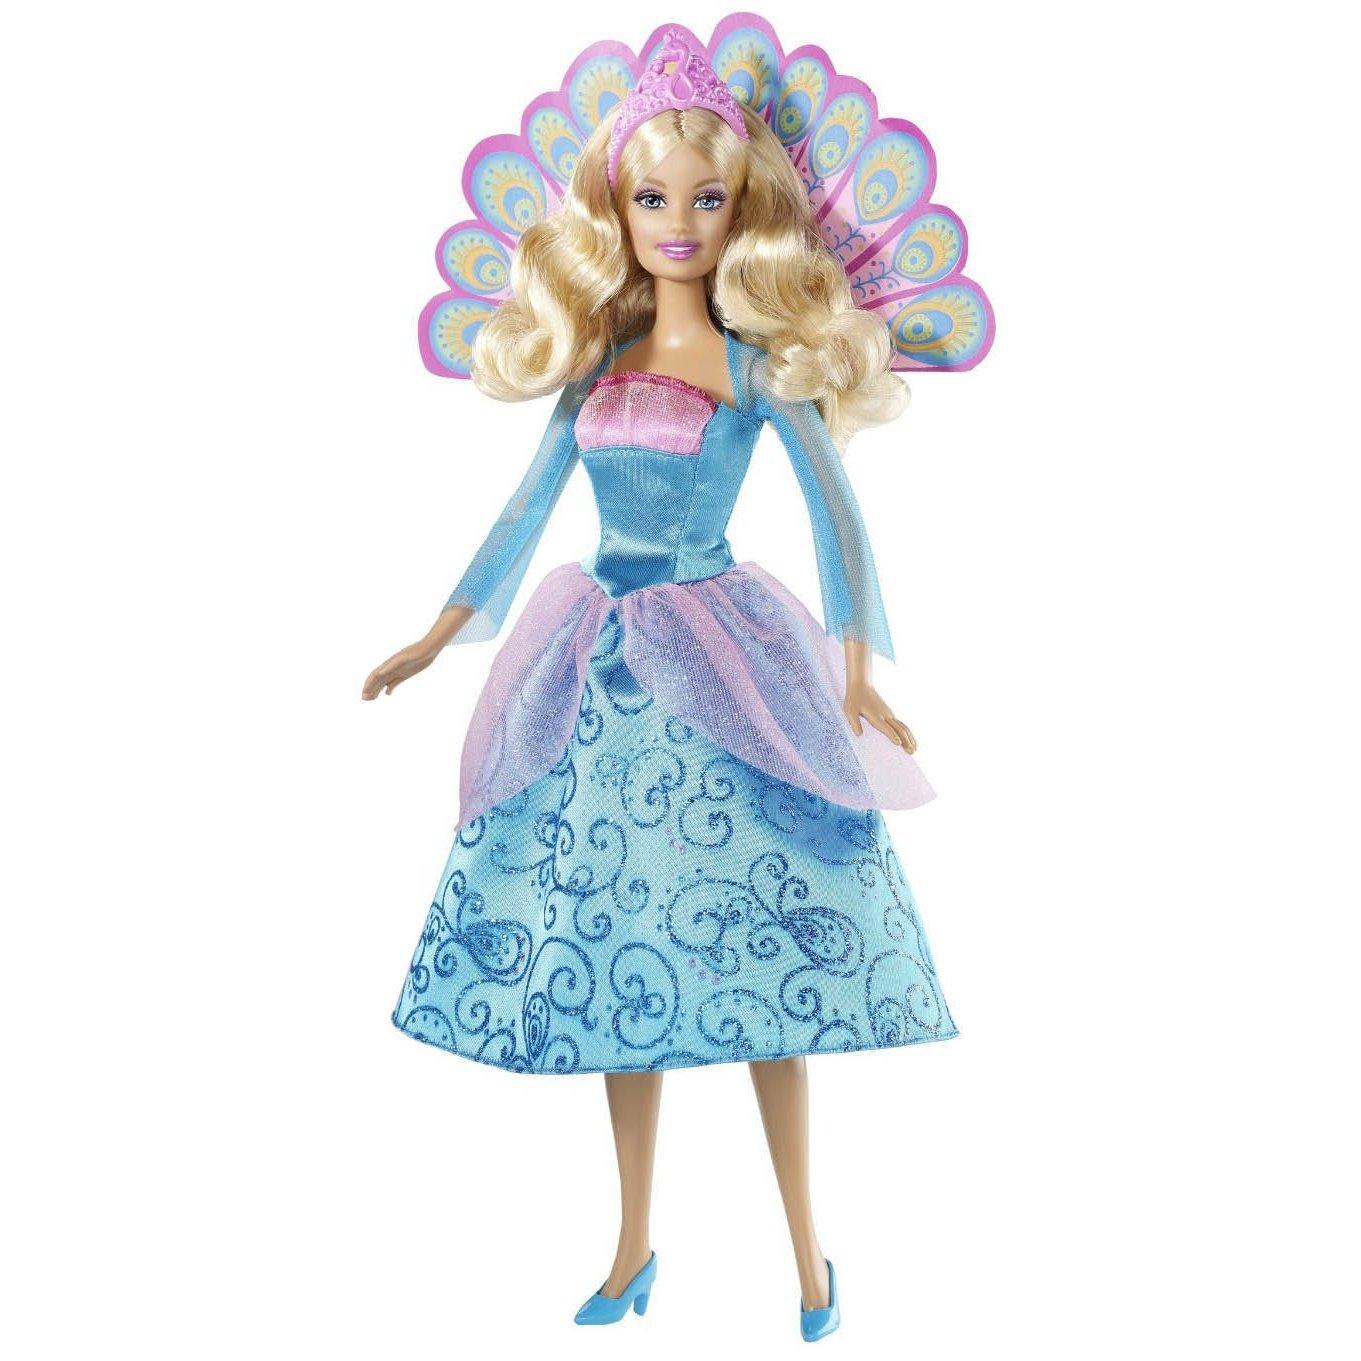 Barbie Rock N Royals Wallpaper: Princess Rosella/Gallery